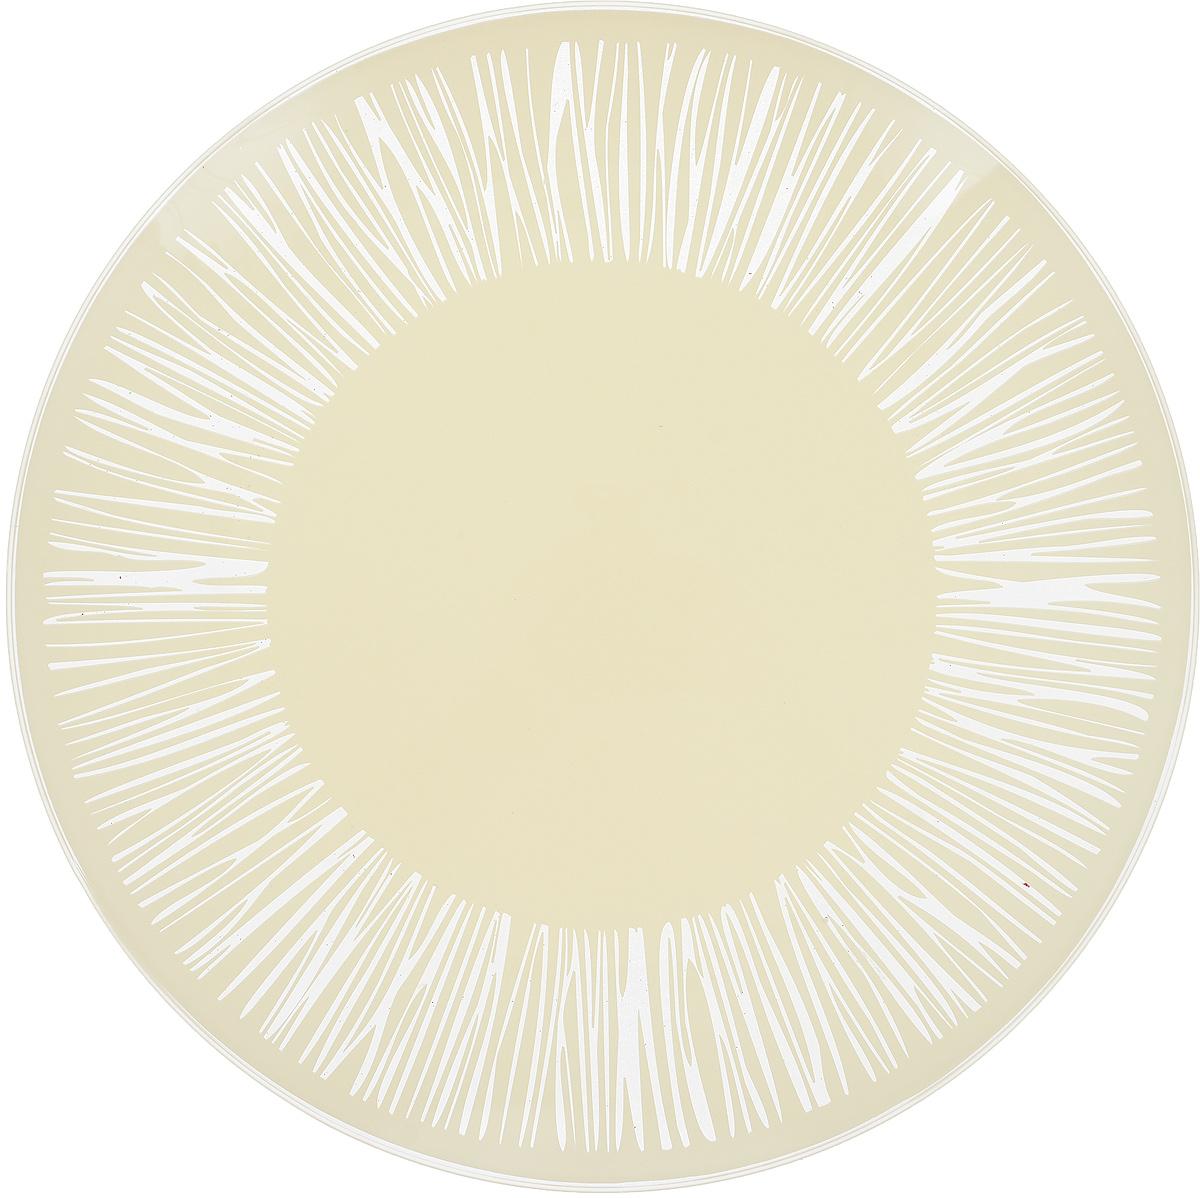 Тарелка NiNaGlass Витас, цвет: белый, диаметр 26 см85-260-016/бел